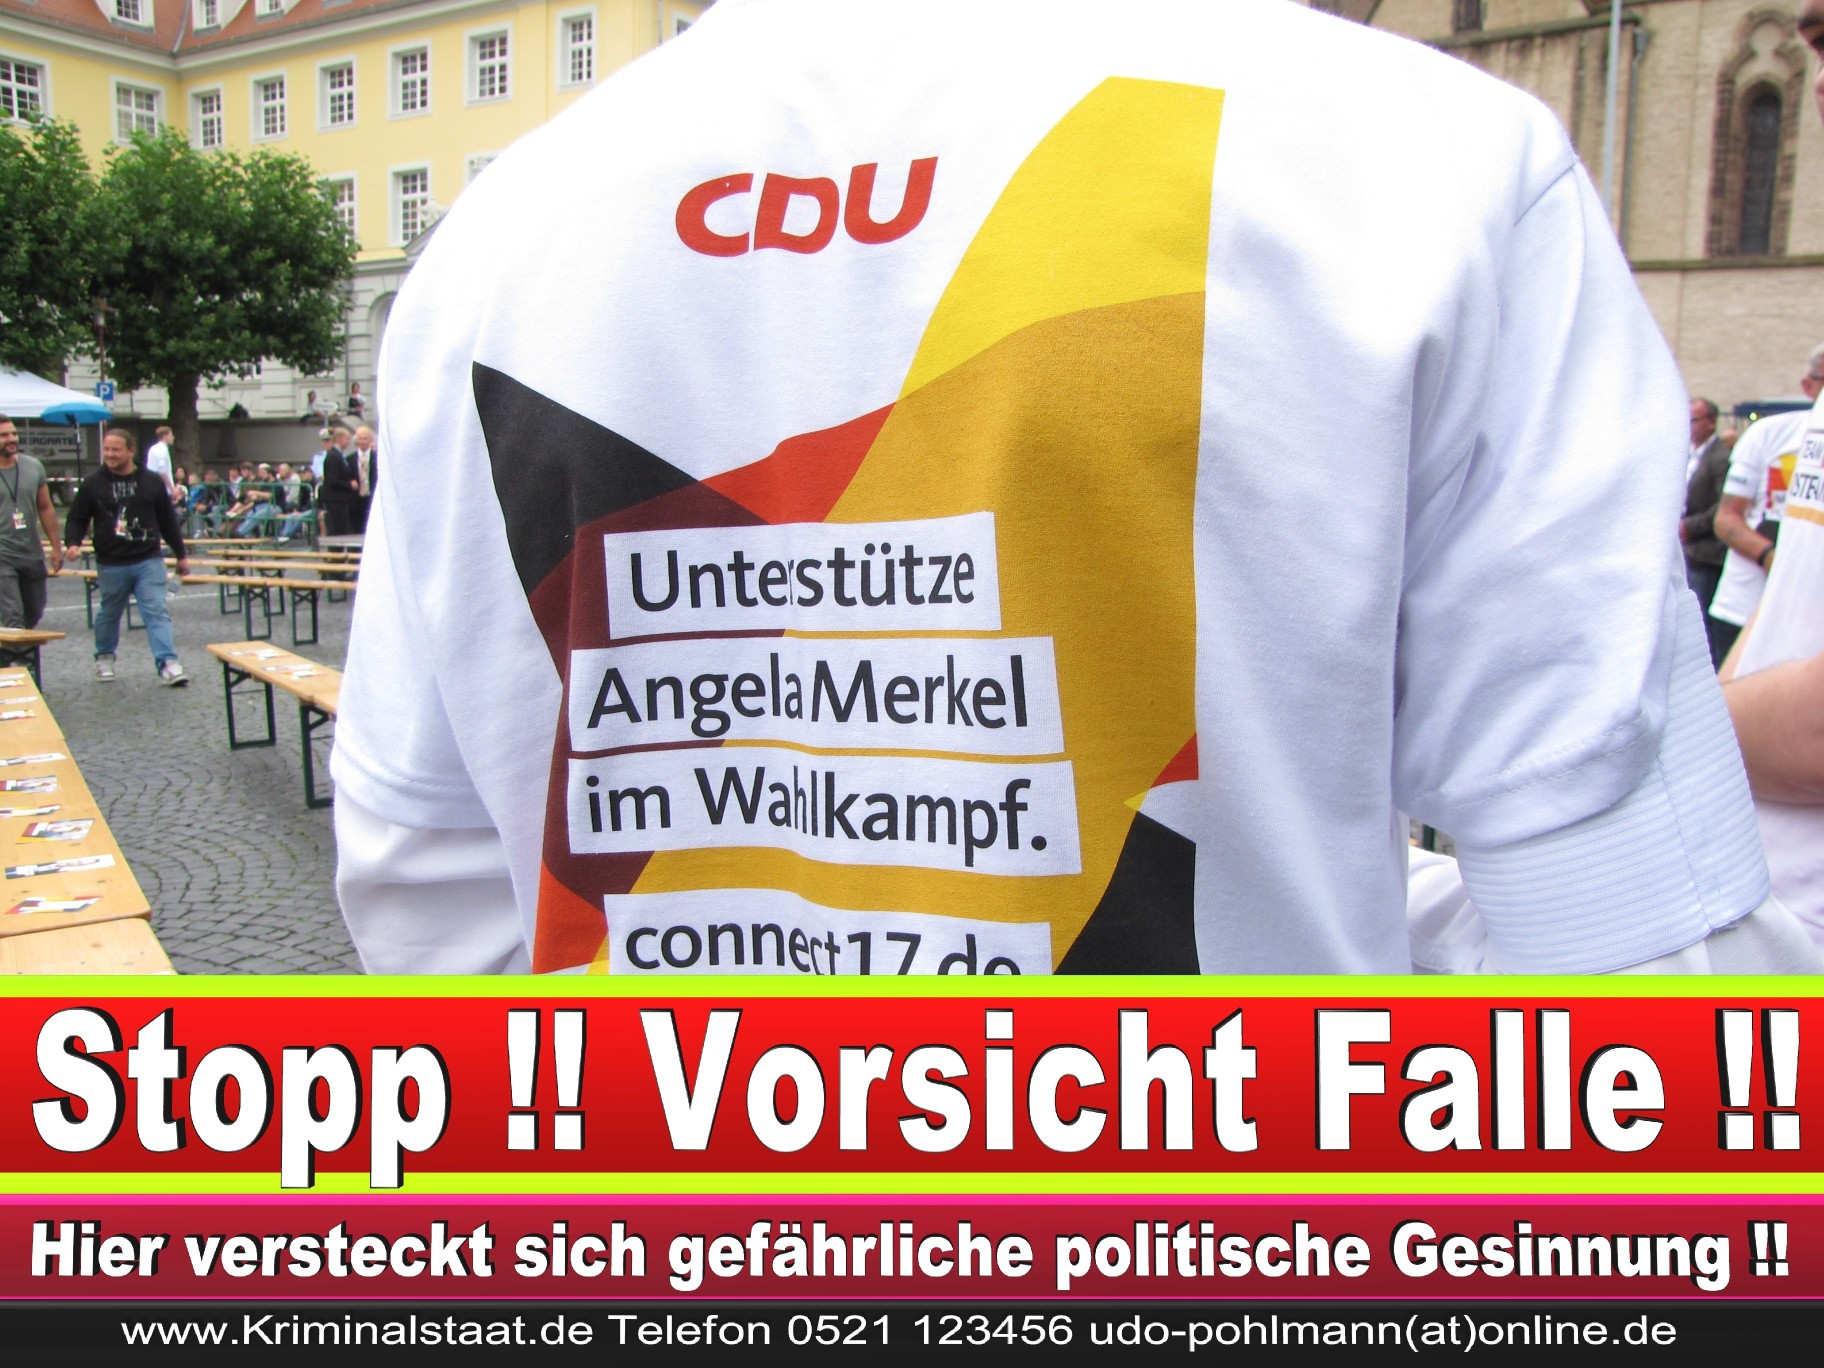 CDU HERFORD Kurruption Betrug Kinderpornografie Kinderpornos 12